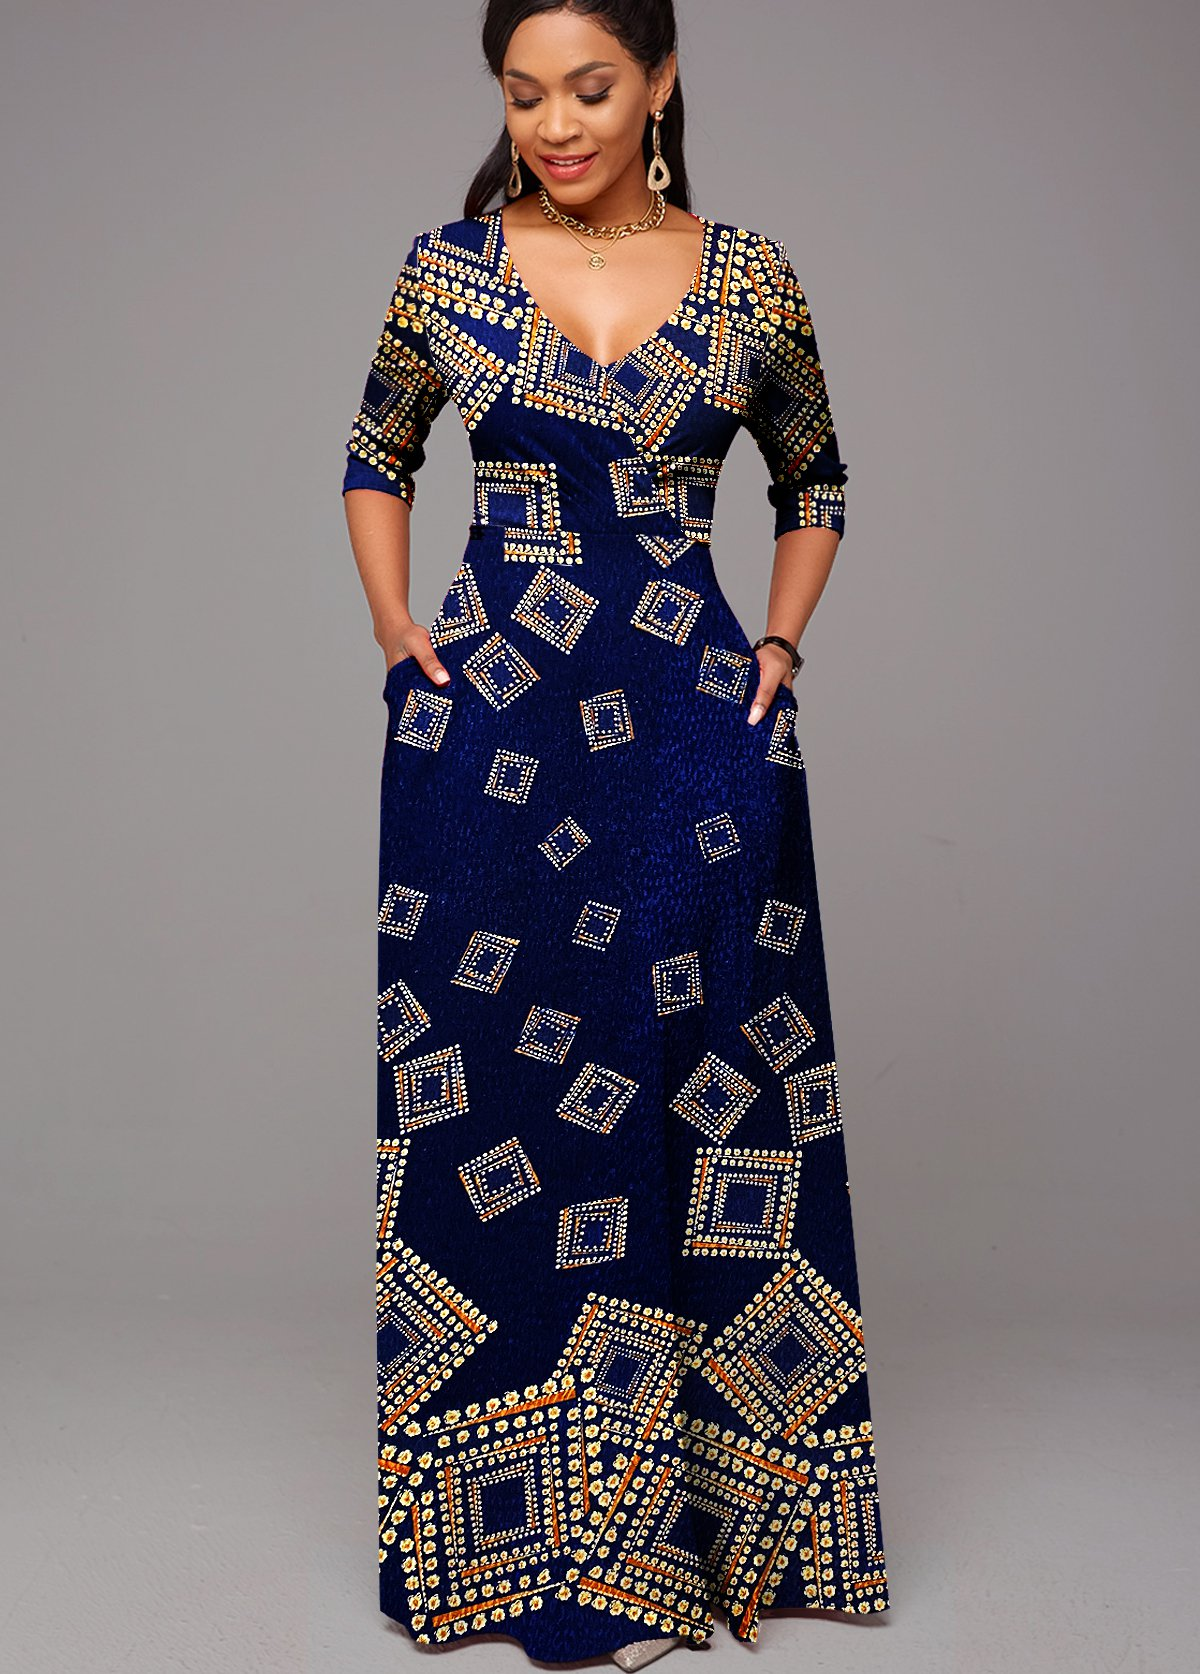 ROTITA Geometrical Pattern Foil Print 3/4 Sleeve Wrap Dress